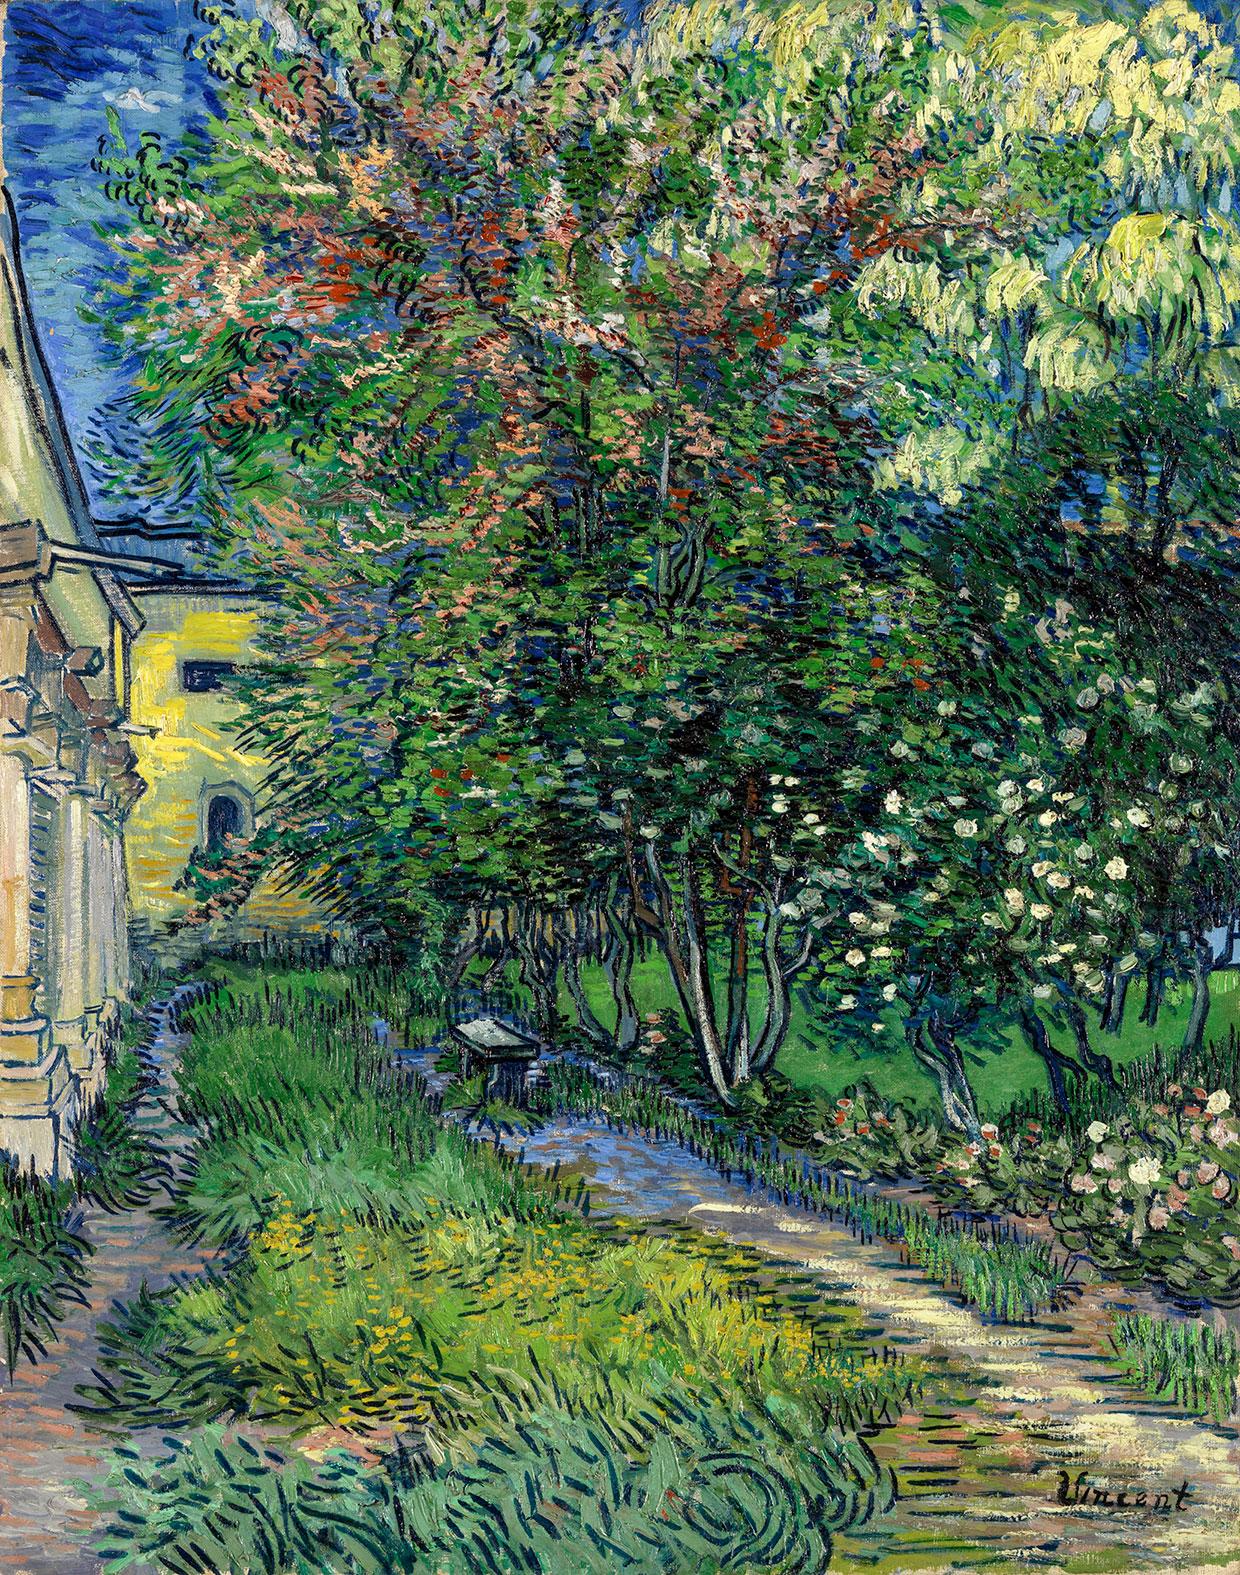 Vincent van Gogh, The garden of the asylum at Saint-Rémy, 1889. Coll. Kröller-Müller Museum, Otterlo